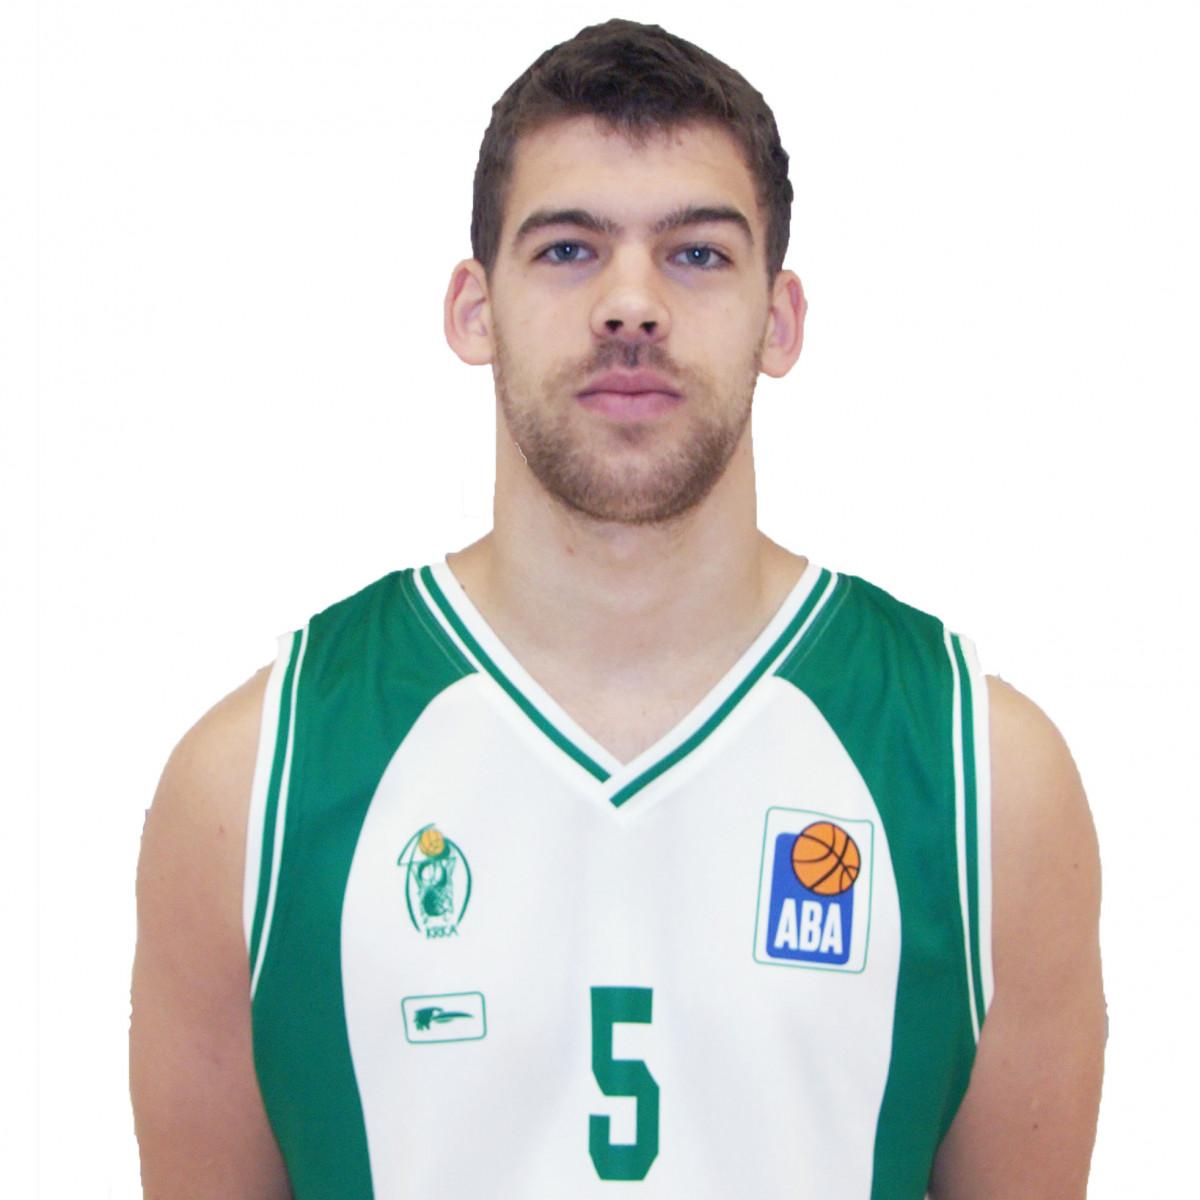 Photo of Paolo Marinelli, 2018-2019 season